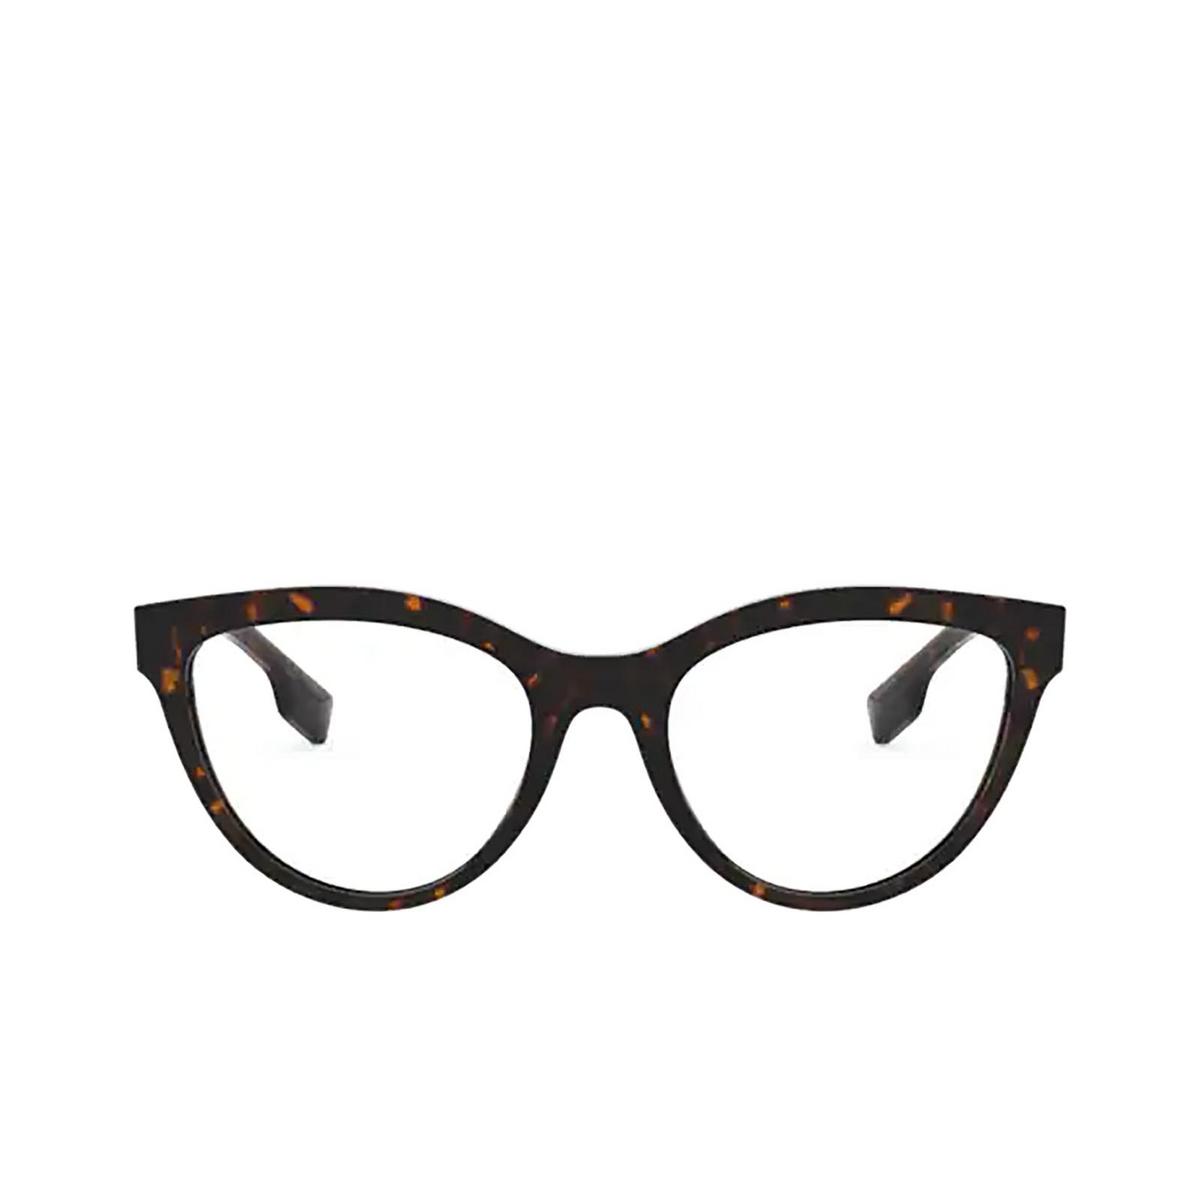 Burberry® Cat-eye Eyeglasses: Lillie BE2311 color Dark Havana 3002 - front view.